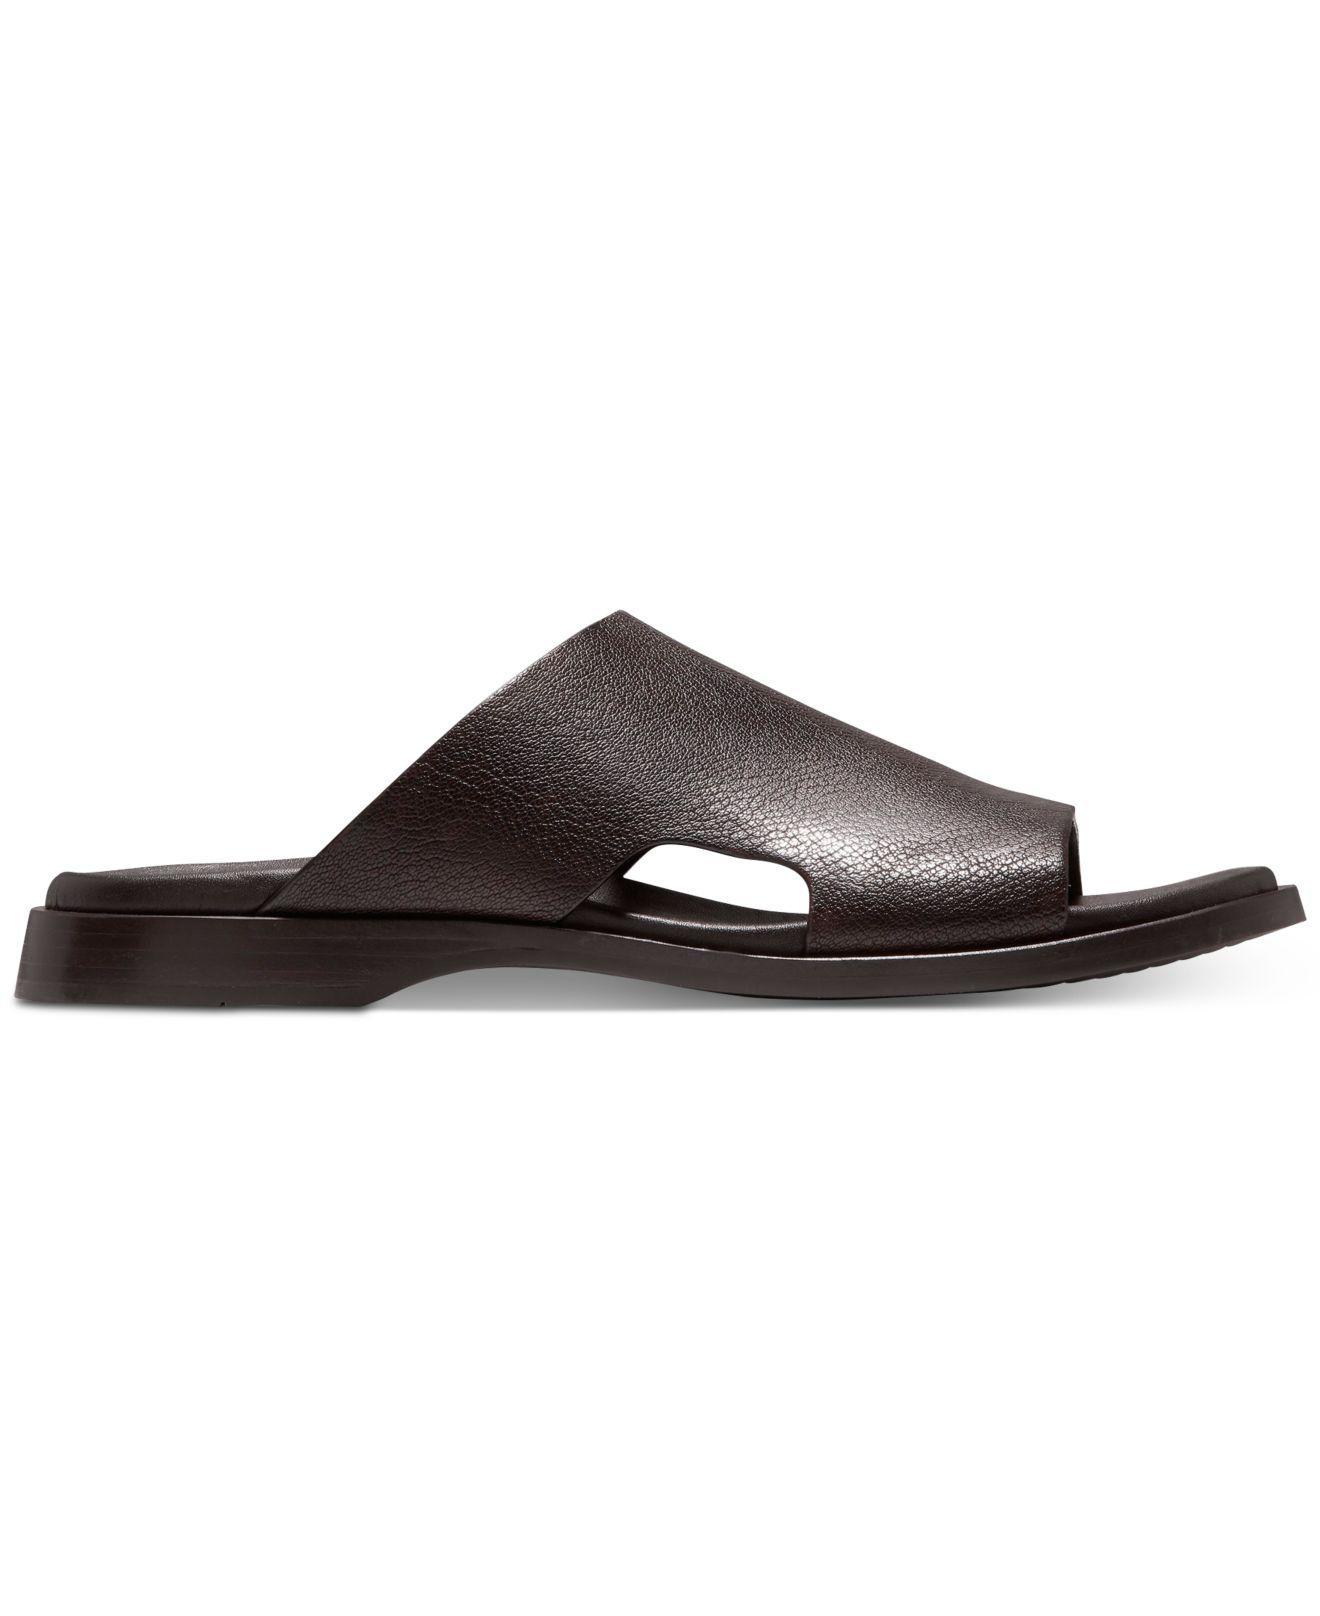 59574adebdaa Lyst - Cole Haan Goldwyn 2.0 Slide Sandals in Brown for Men - Save 33%